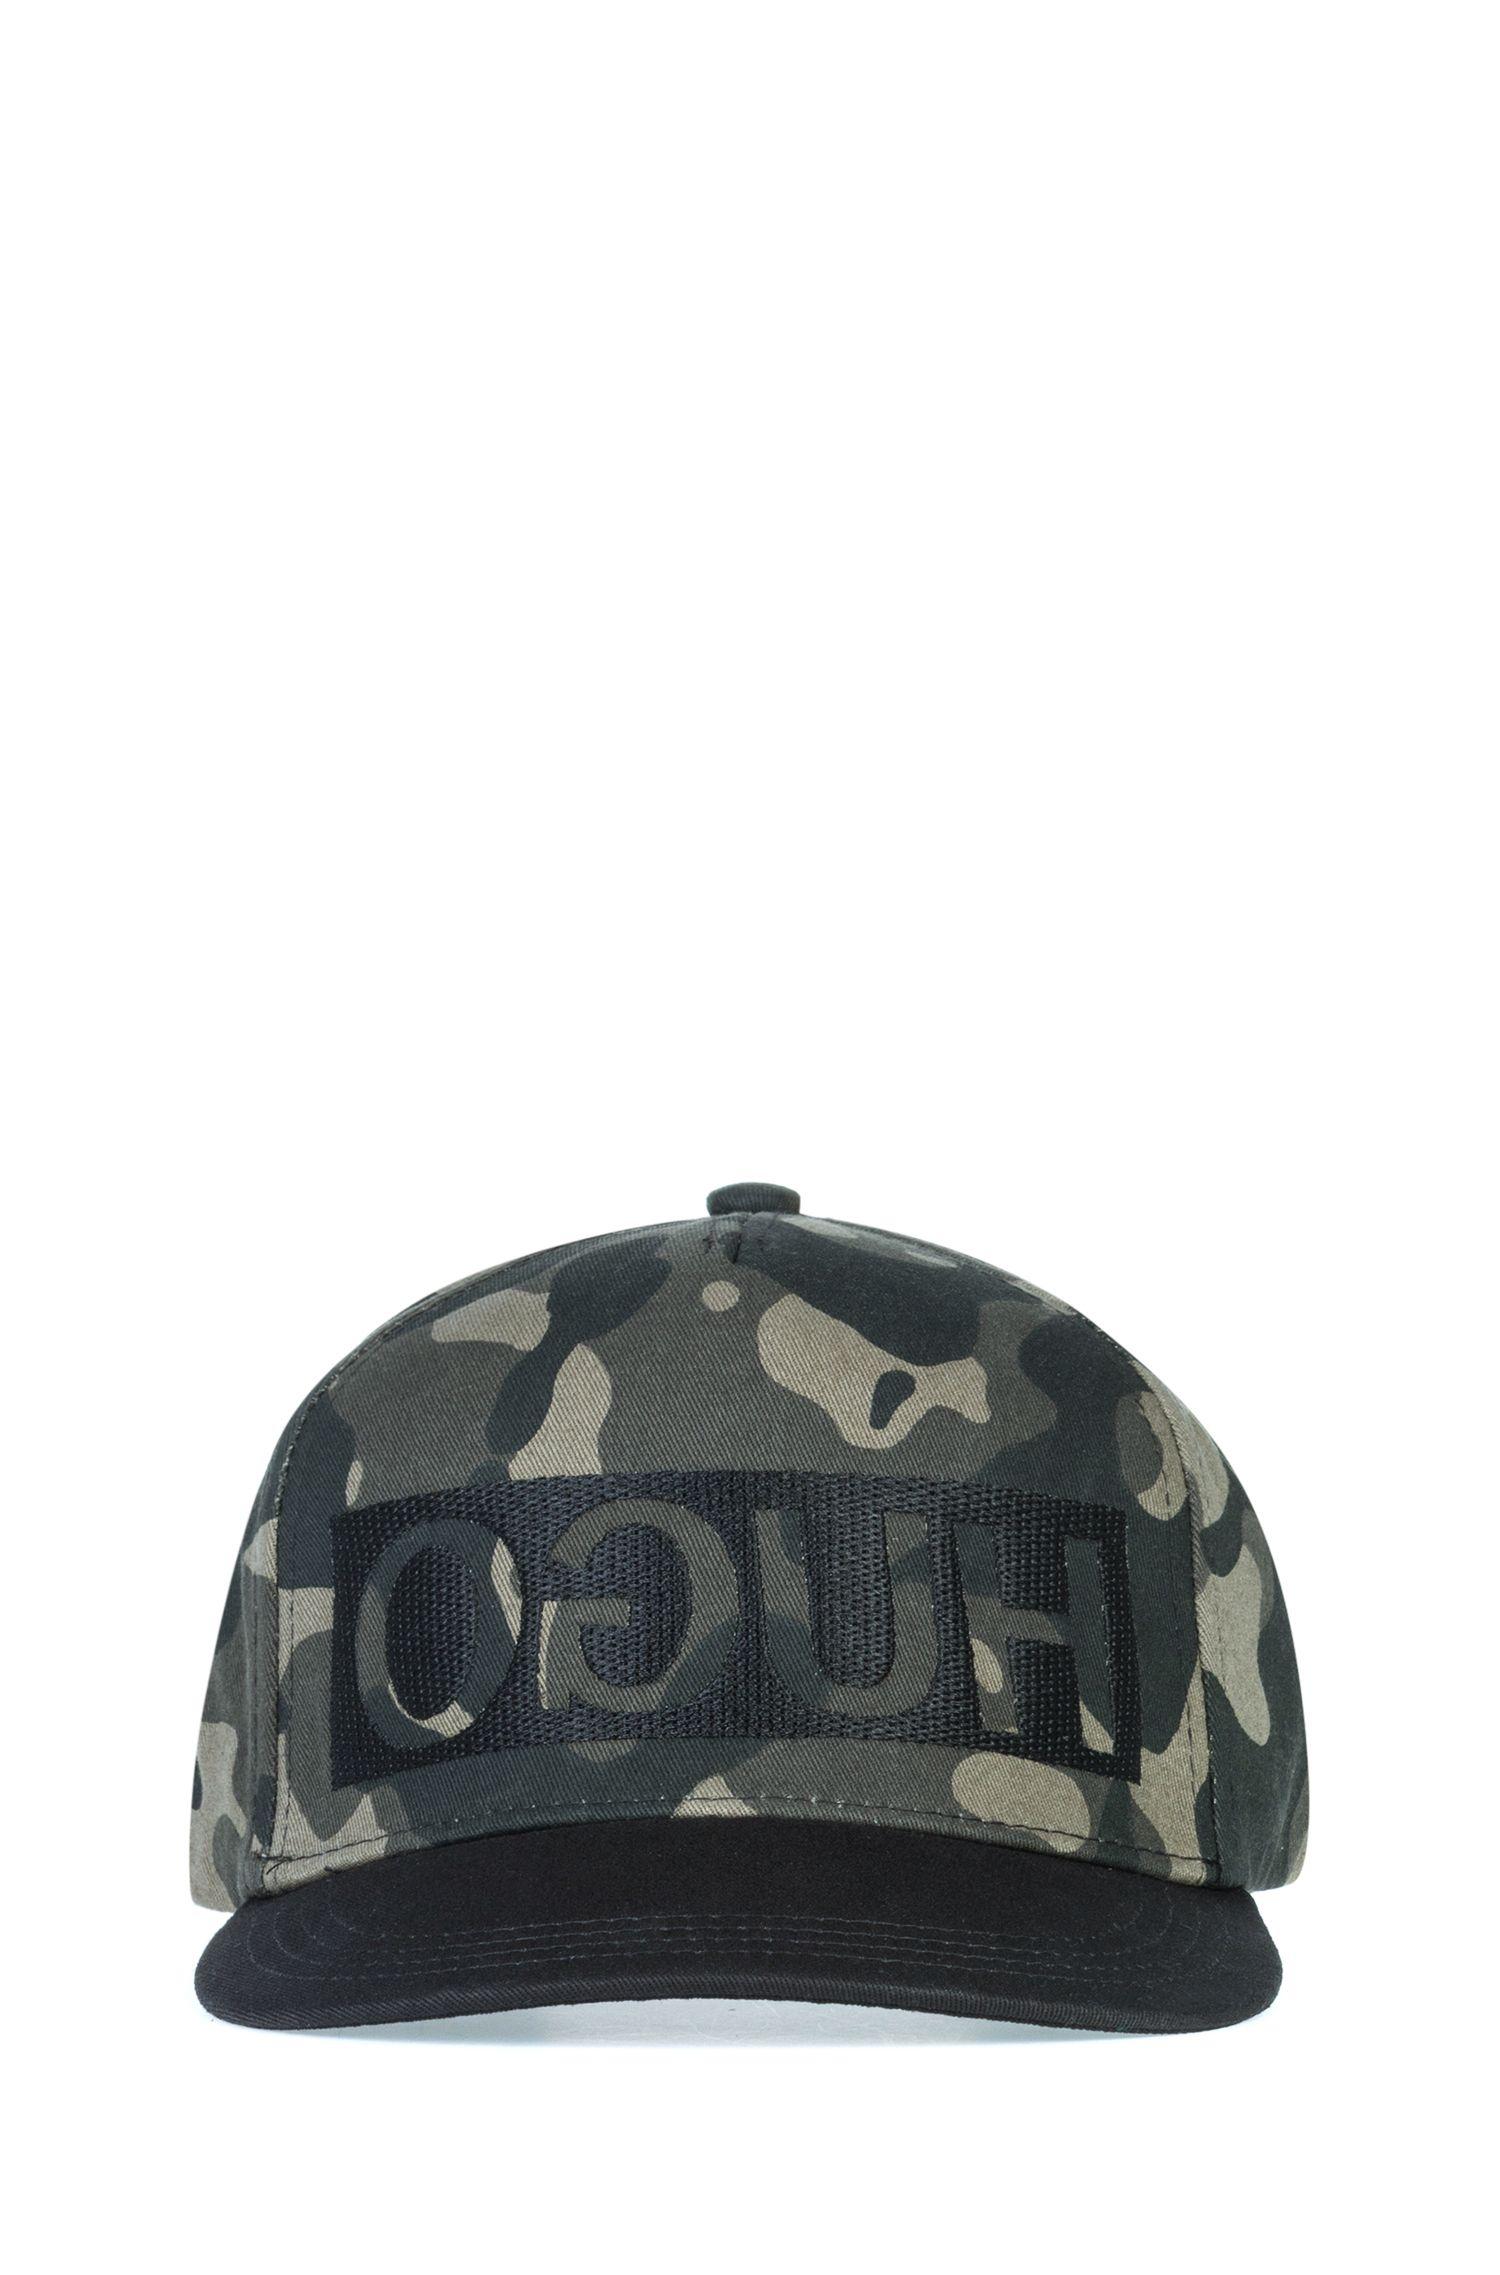 Reverse-logo snapback cap in camouflage cotton gabardine, Patterned